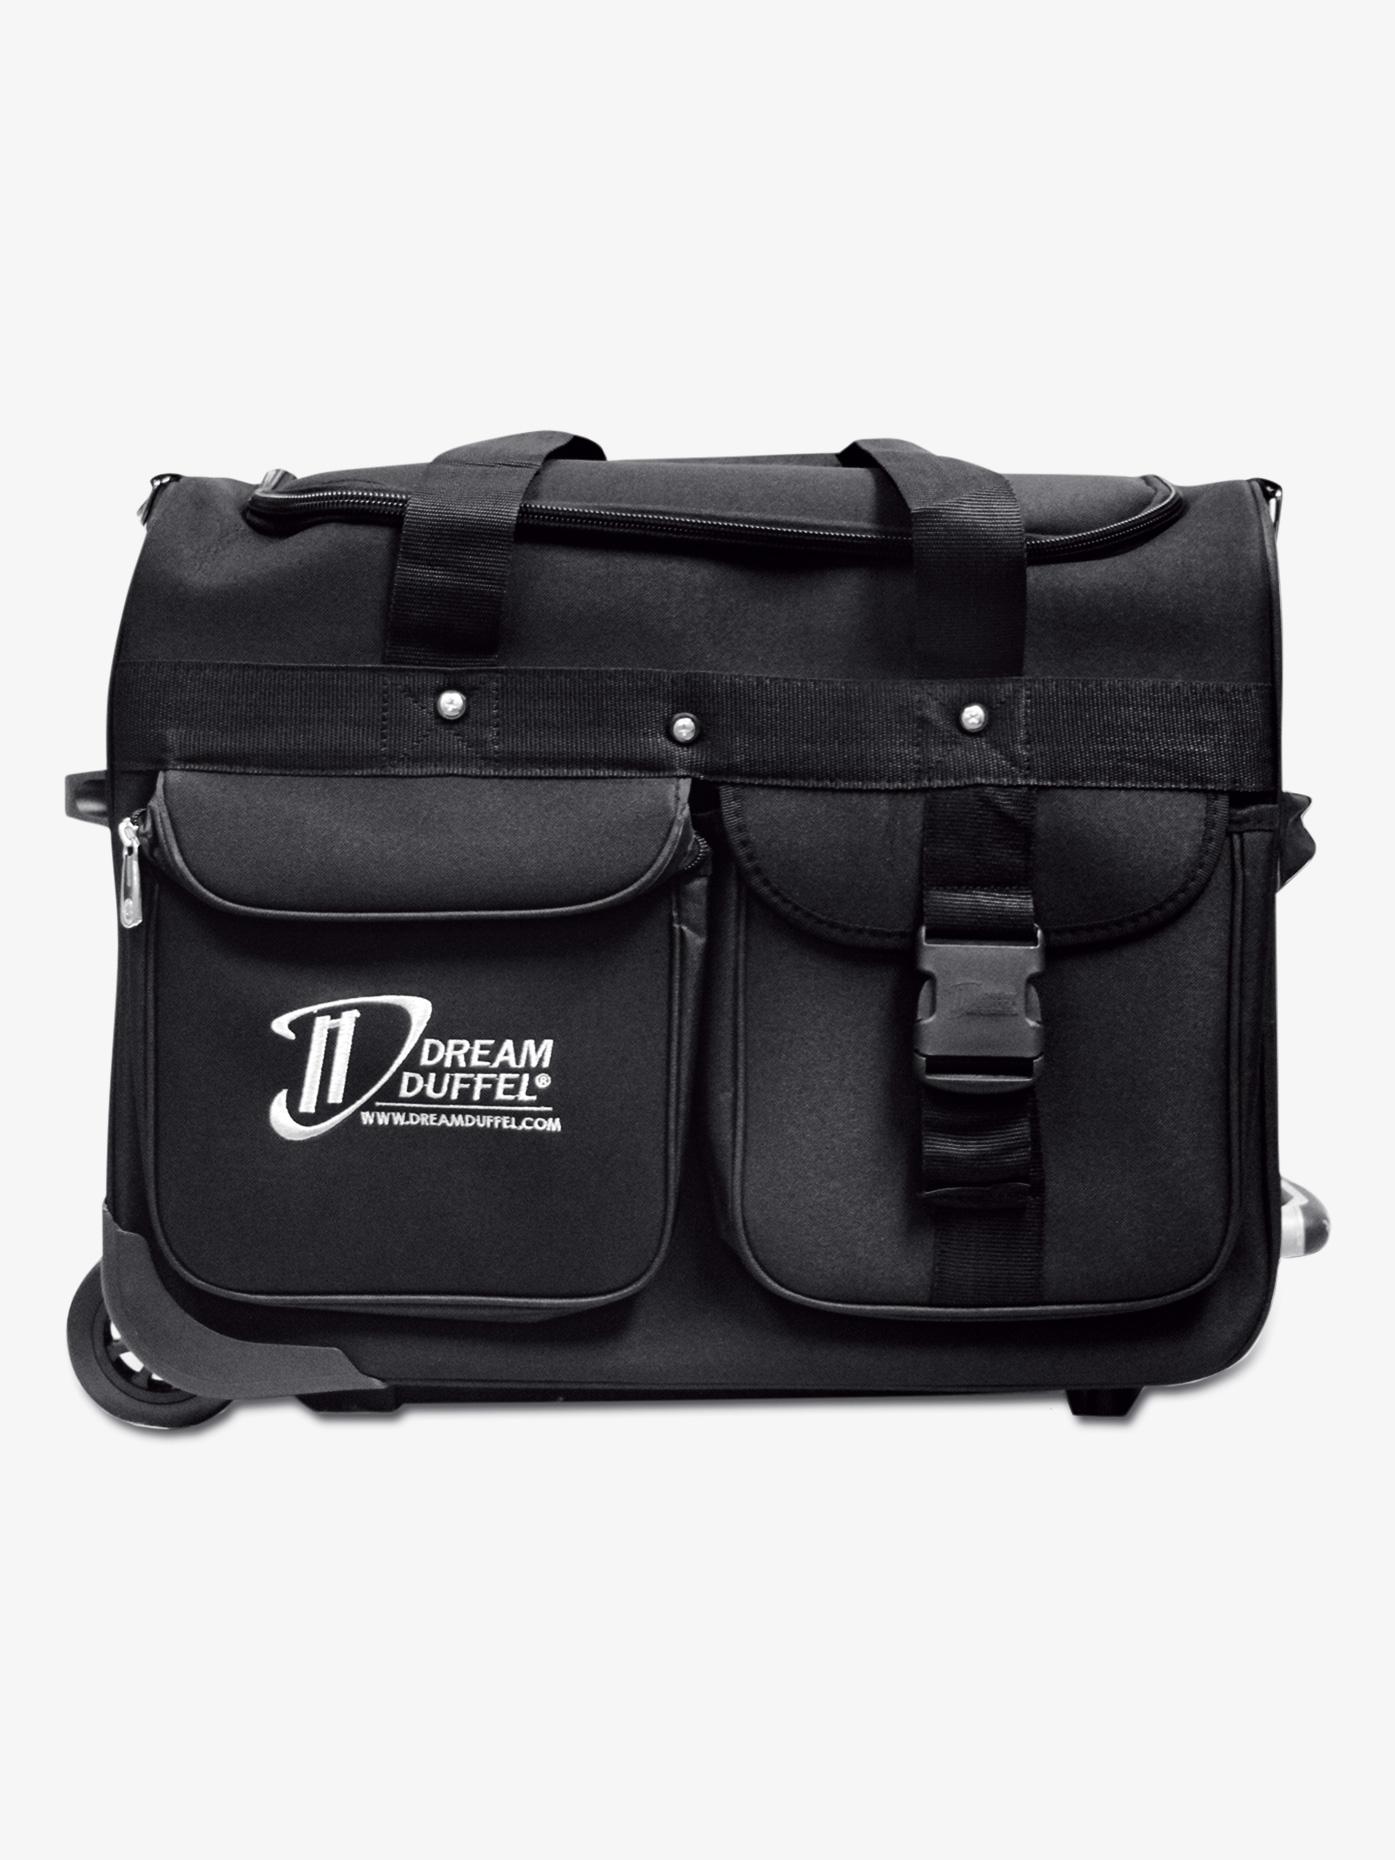 Dream Duffel Bags And Accessories At Danceweardeals Com